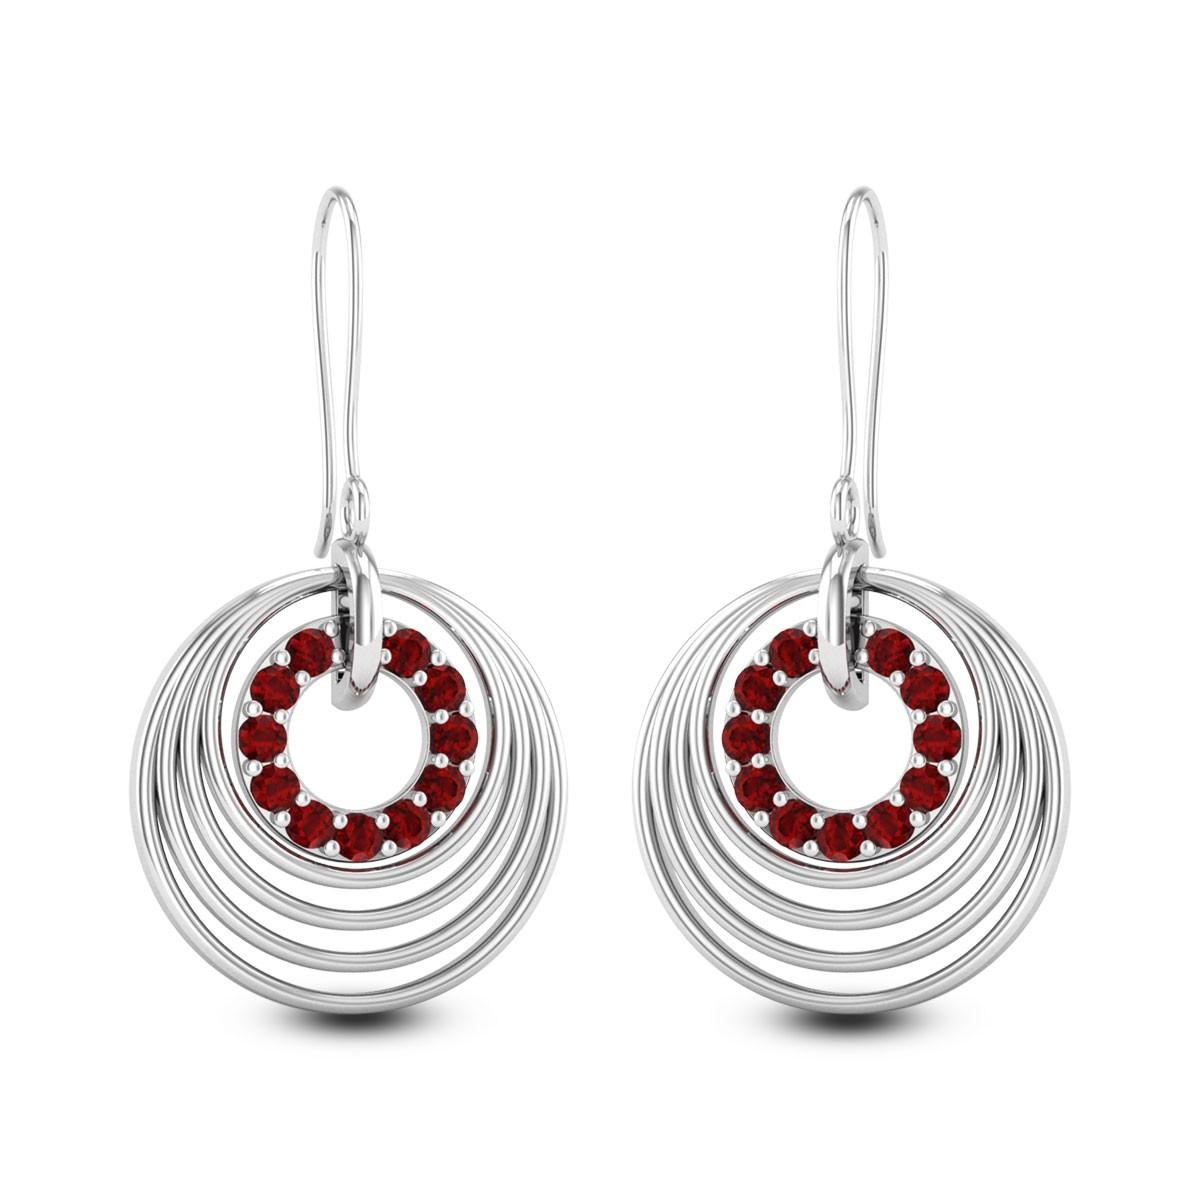 Circula Ruby Hanging Earrings